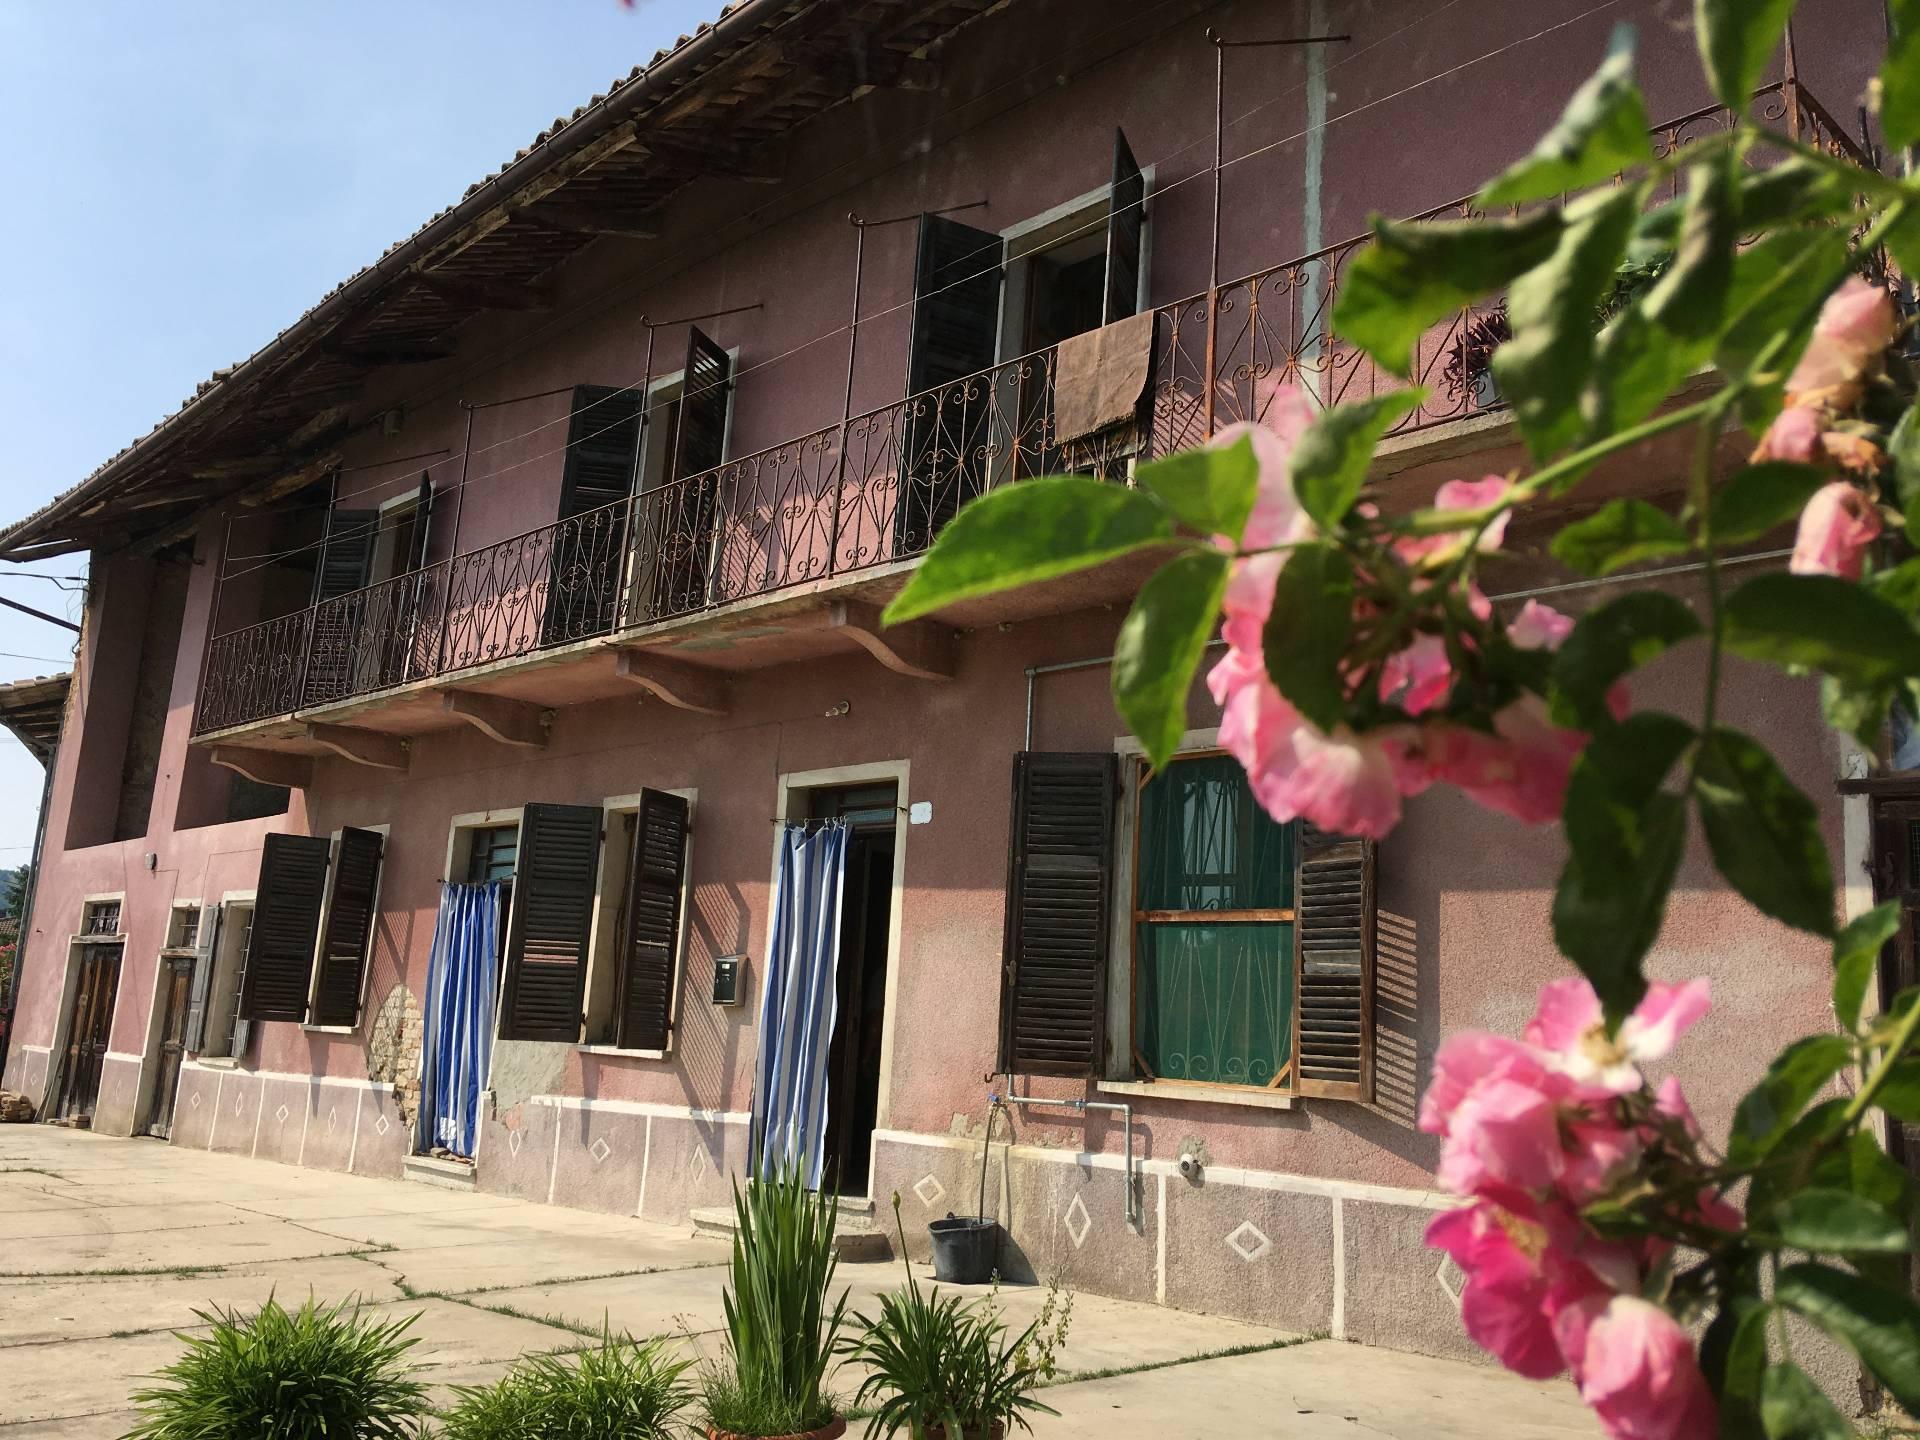 Murisengo, Via Cerro